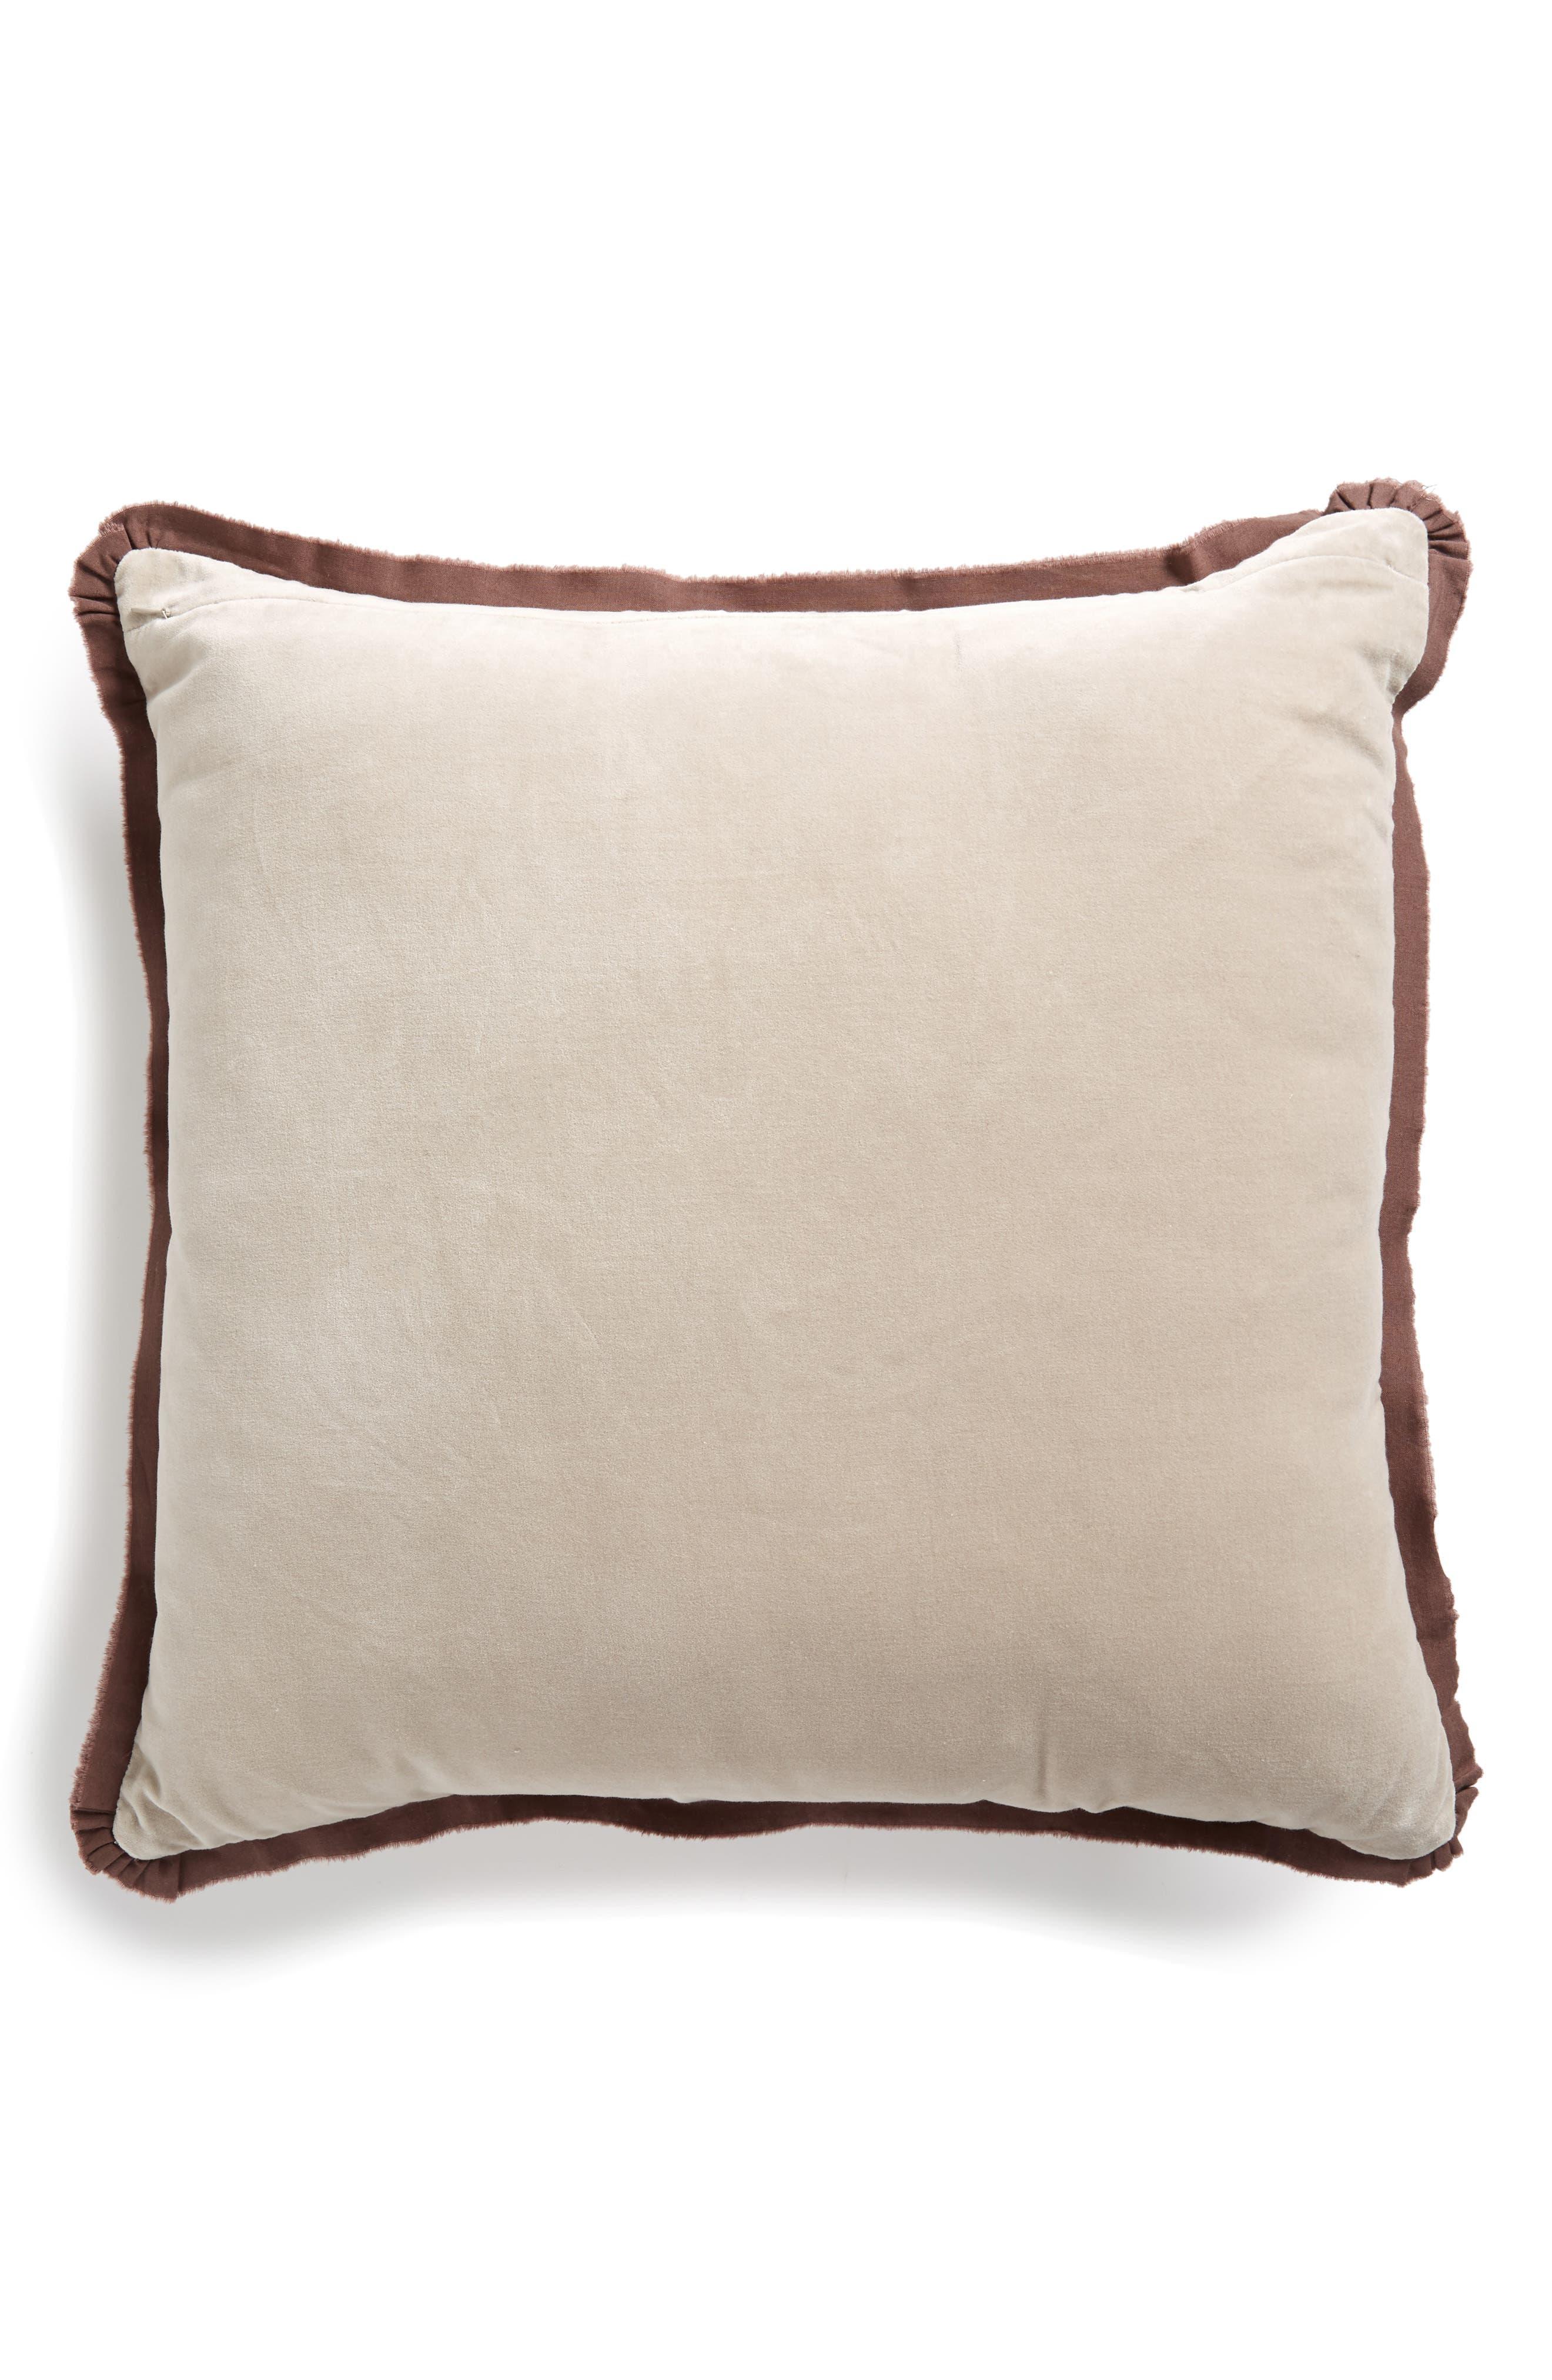 TREASURE & BOND,                             Sun Print Square Accent Pillow,                             Alternate thumbnail 2, color,                             BROWN ROSE